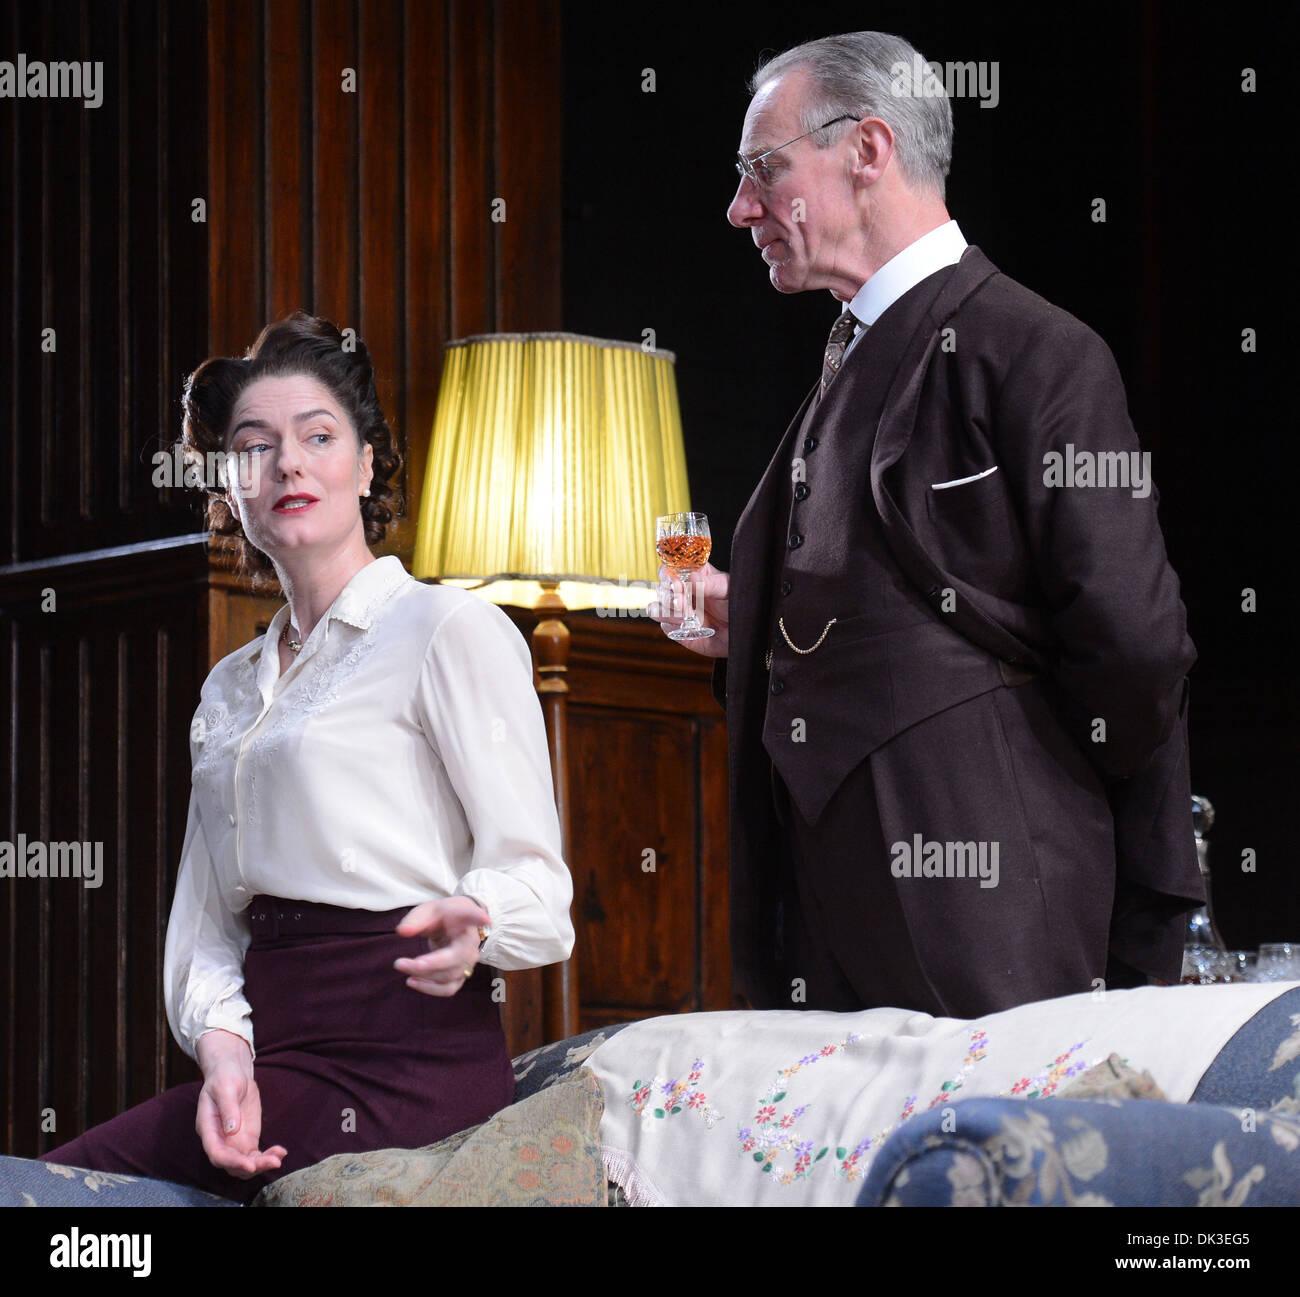 Anna Chancellor Photo call for Browning Version at Harold Pinter Theatre London England- 23.04.12 Stock Photo